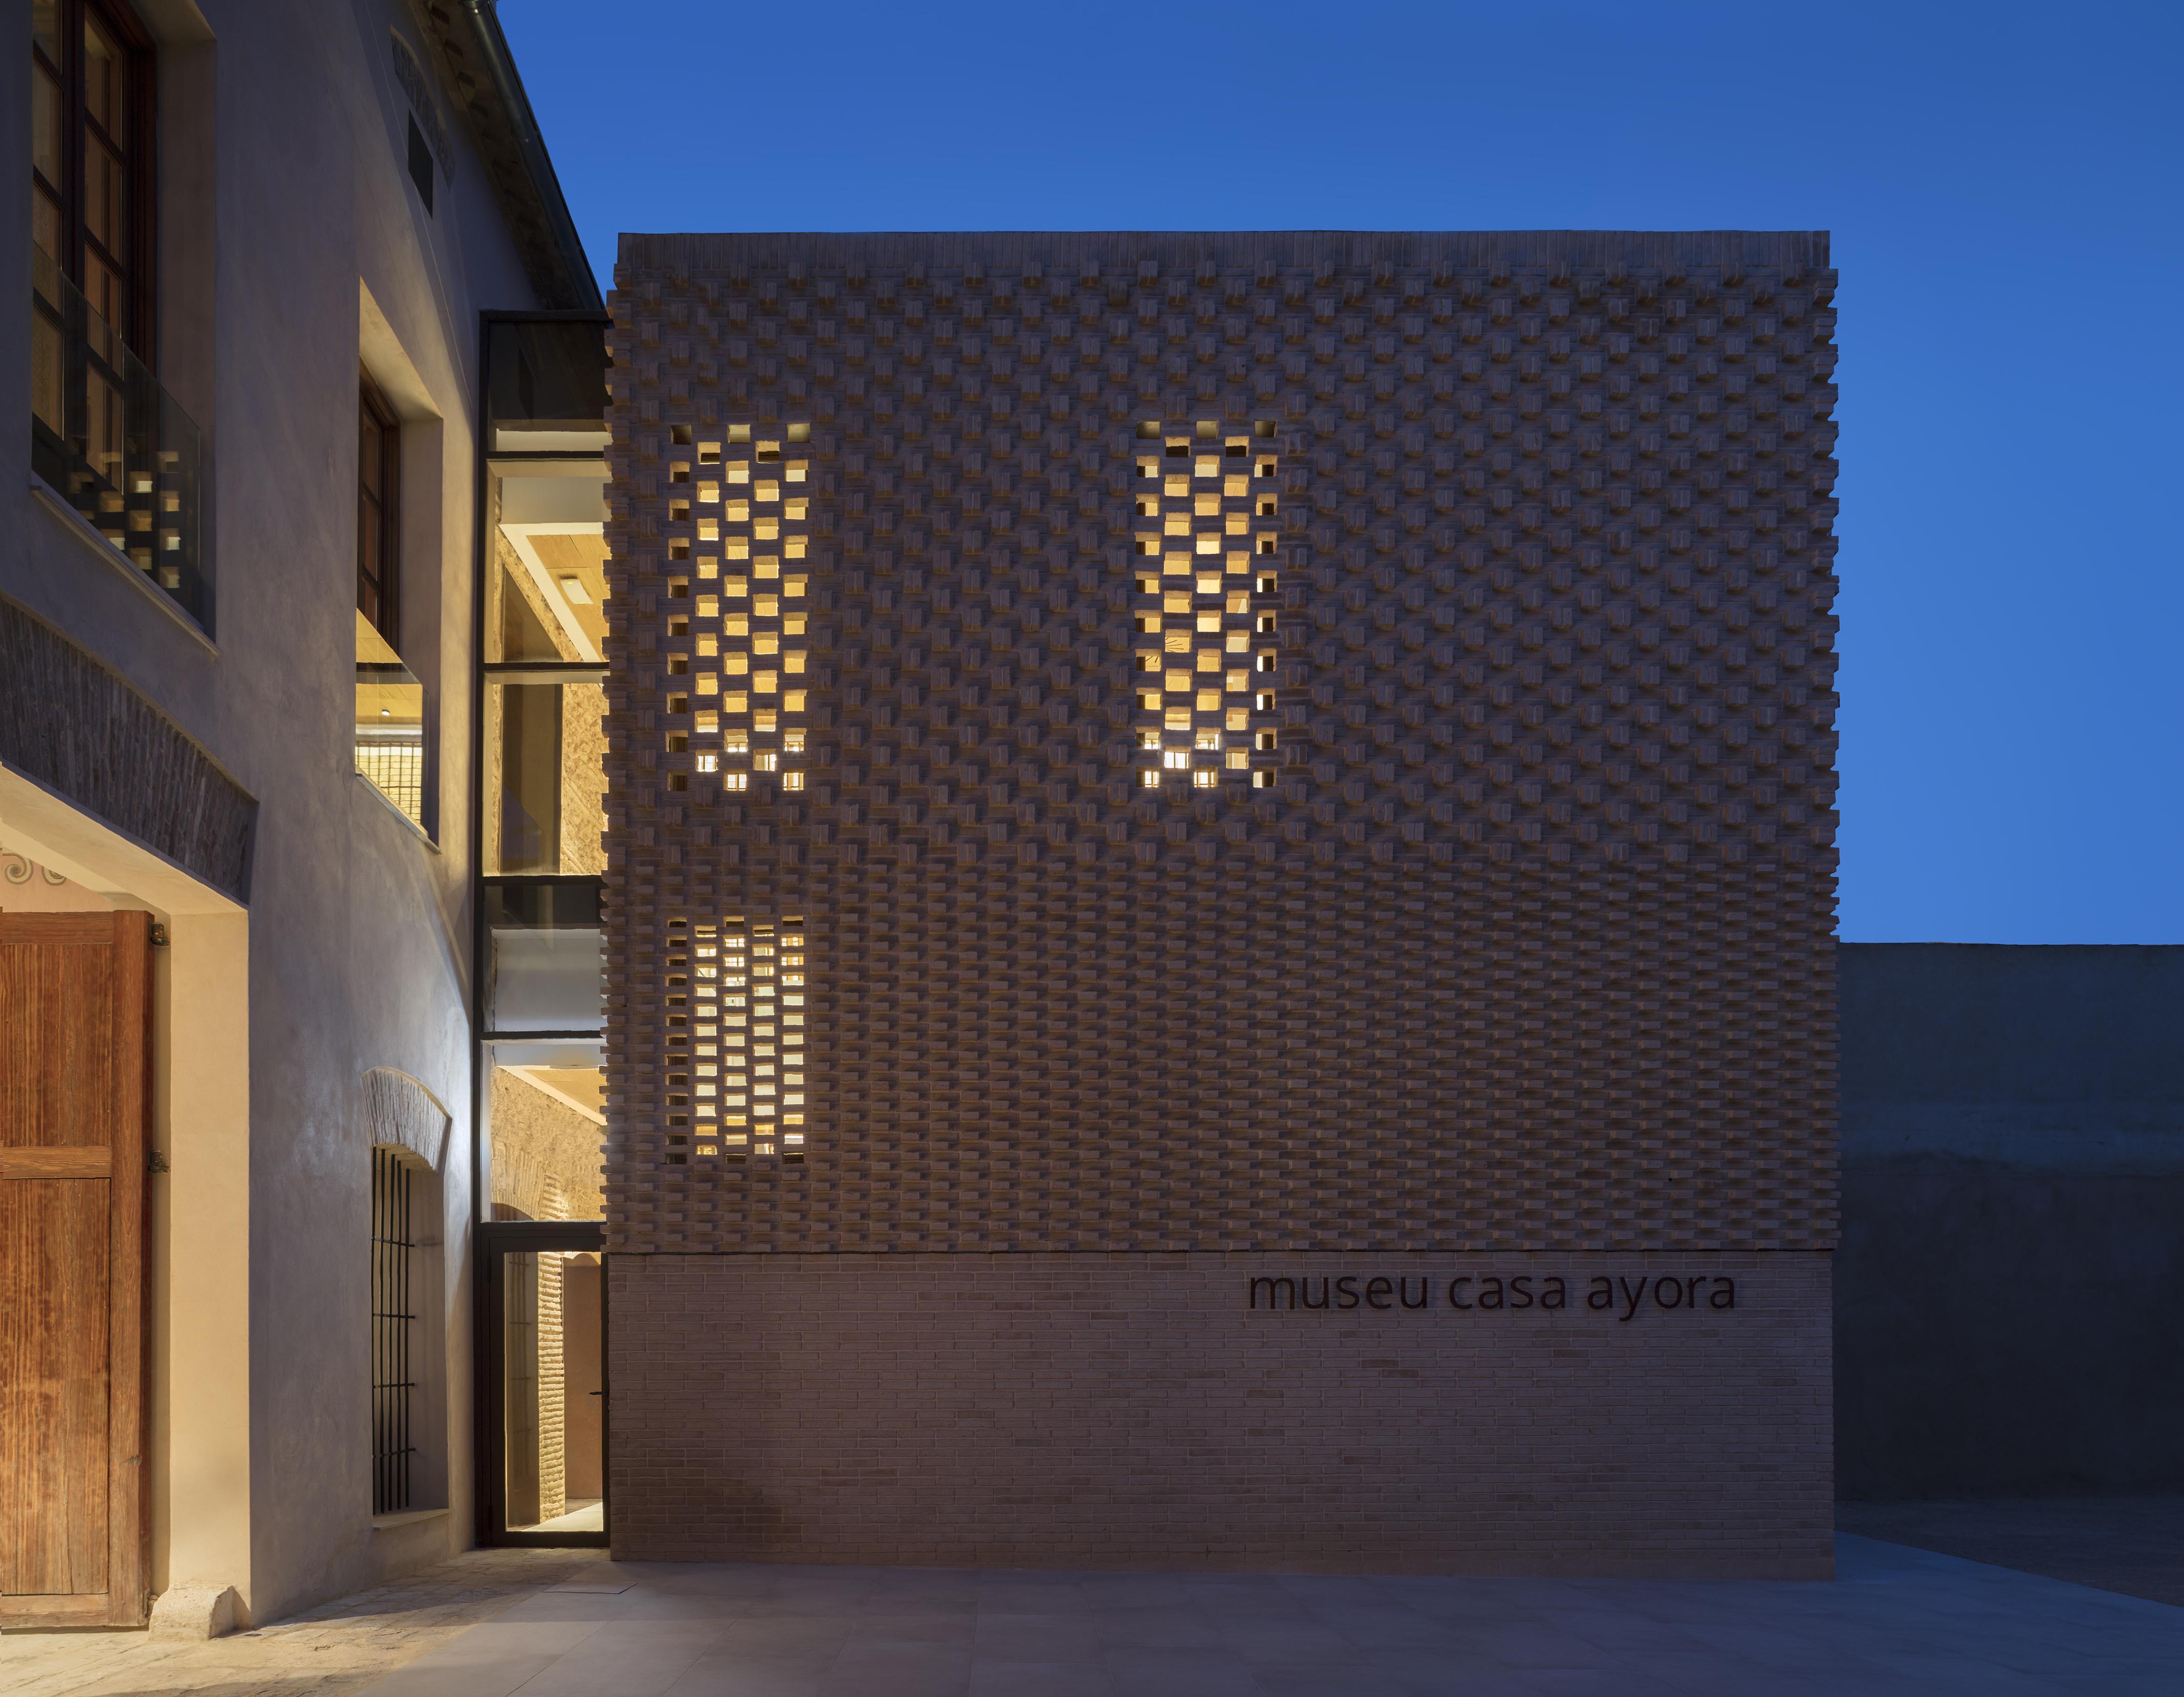 14B Museu Casa Ayora ©Milena Villalba 2020